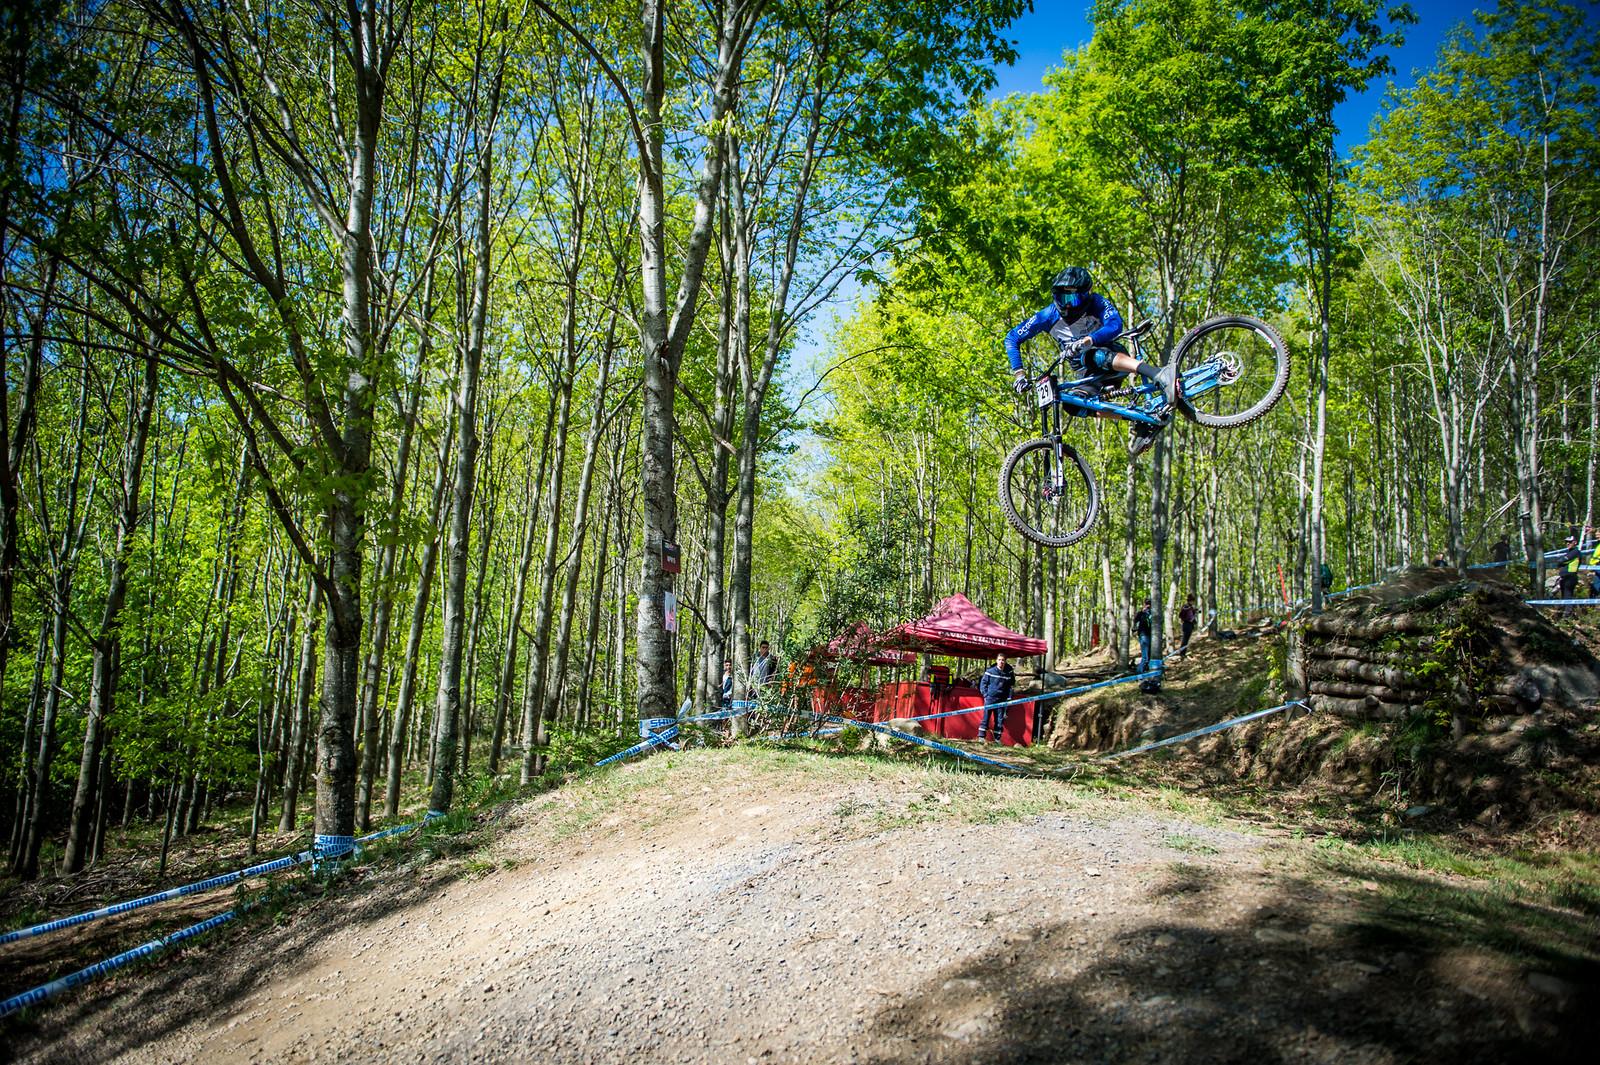 Benoit Coulanges - iceman2058 - Mountain Biking Pictures - Vital MTB